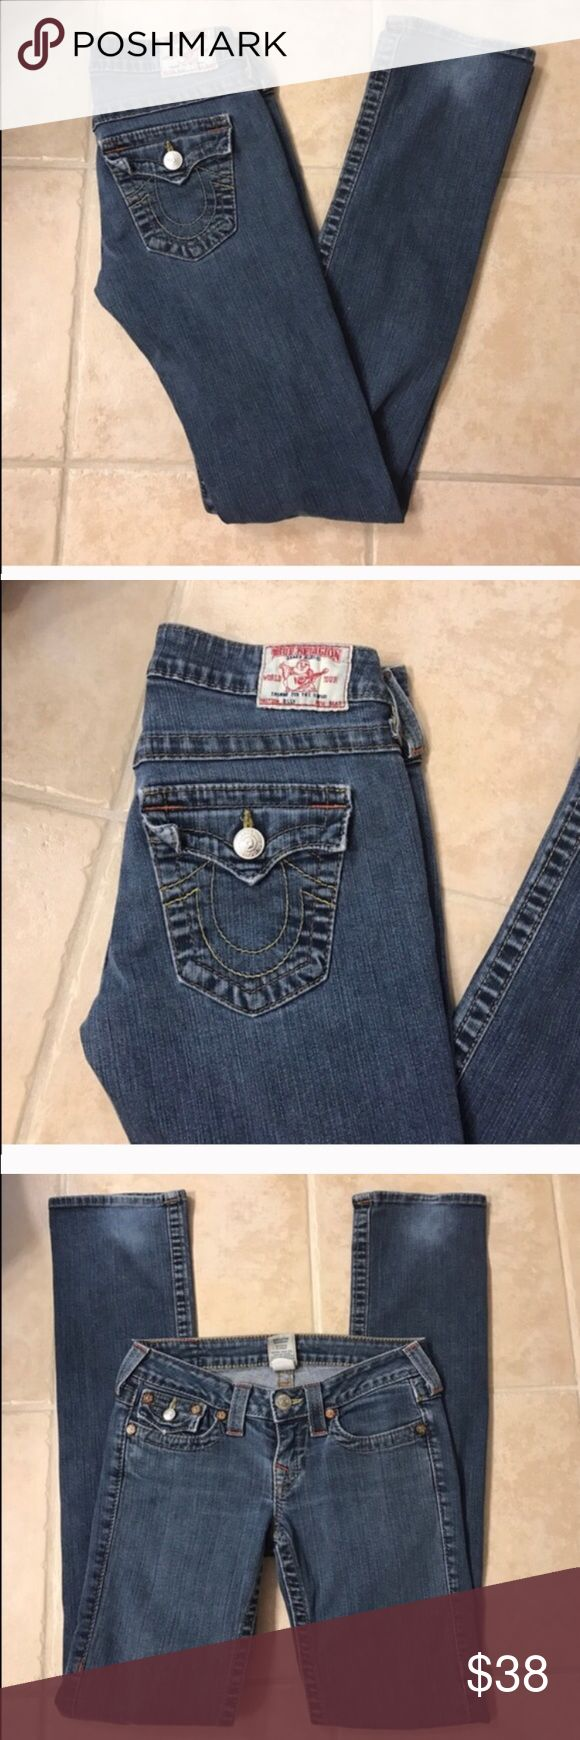 Size 26 True Religion straight cut jeans Size 26 True Religion straight cut jeans True Religion Jeans